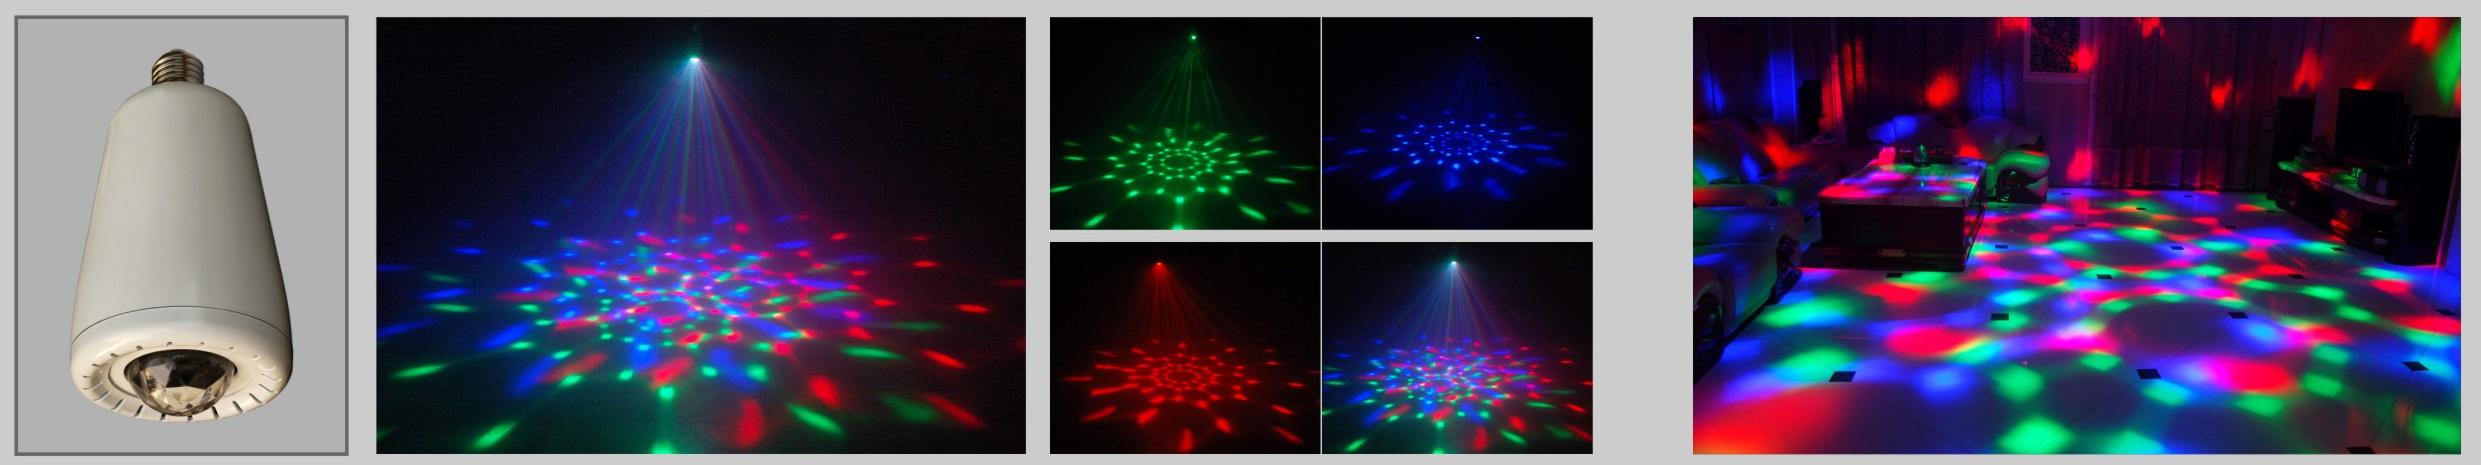 fotismos_led_diamond_ball_gia_nyxterina_kentra_clubs_bars